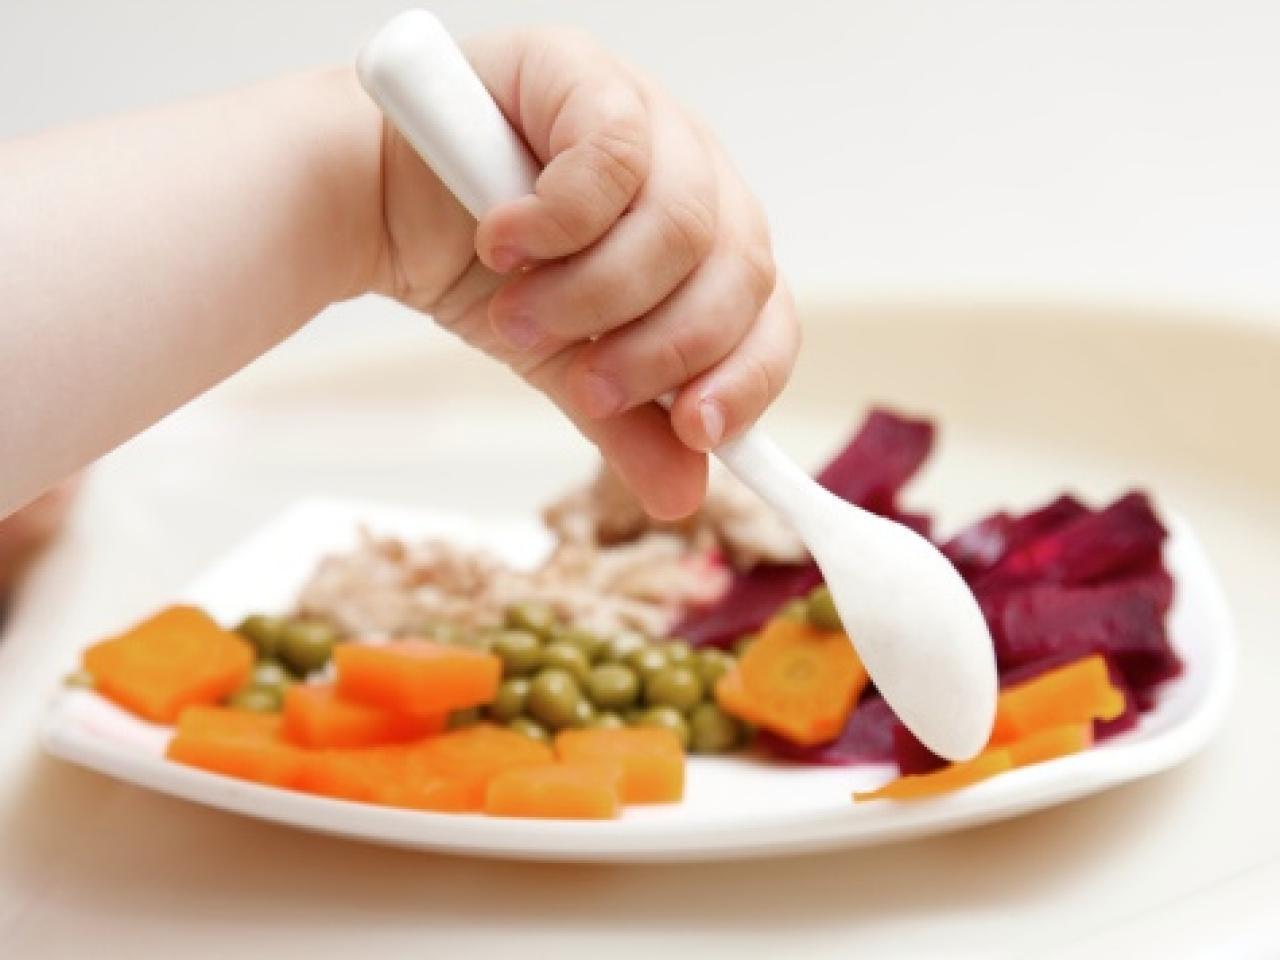 Help change a simple diet for children